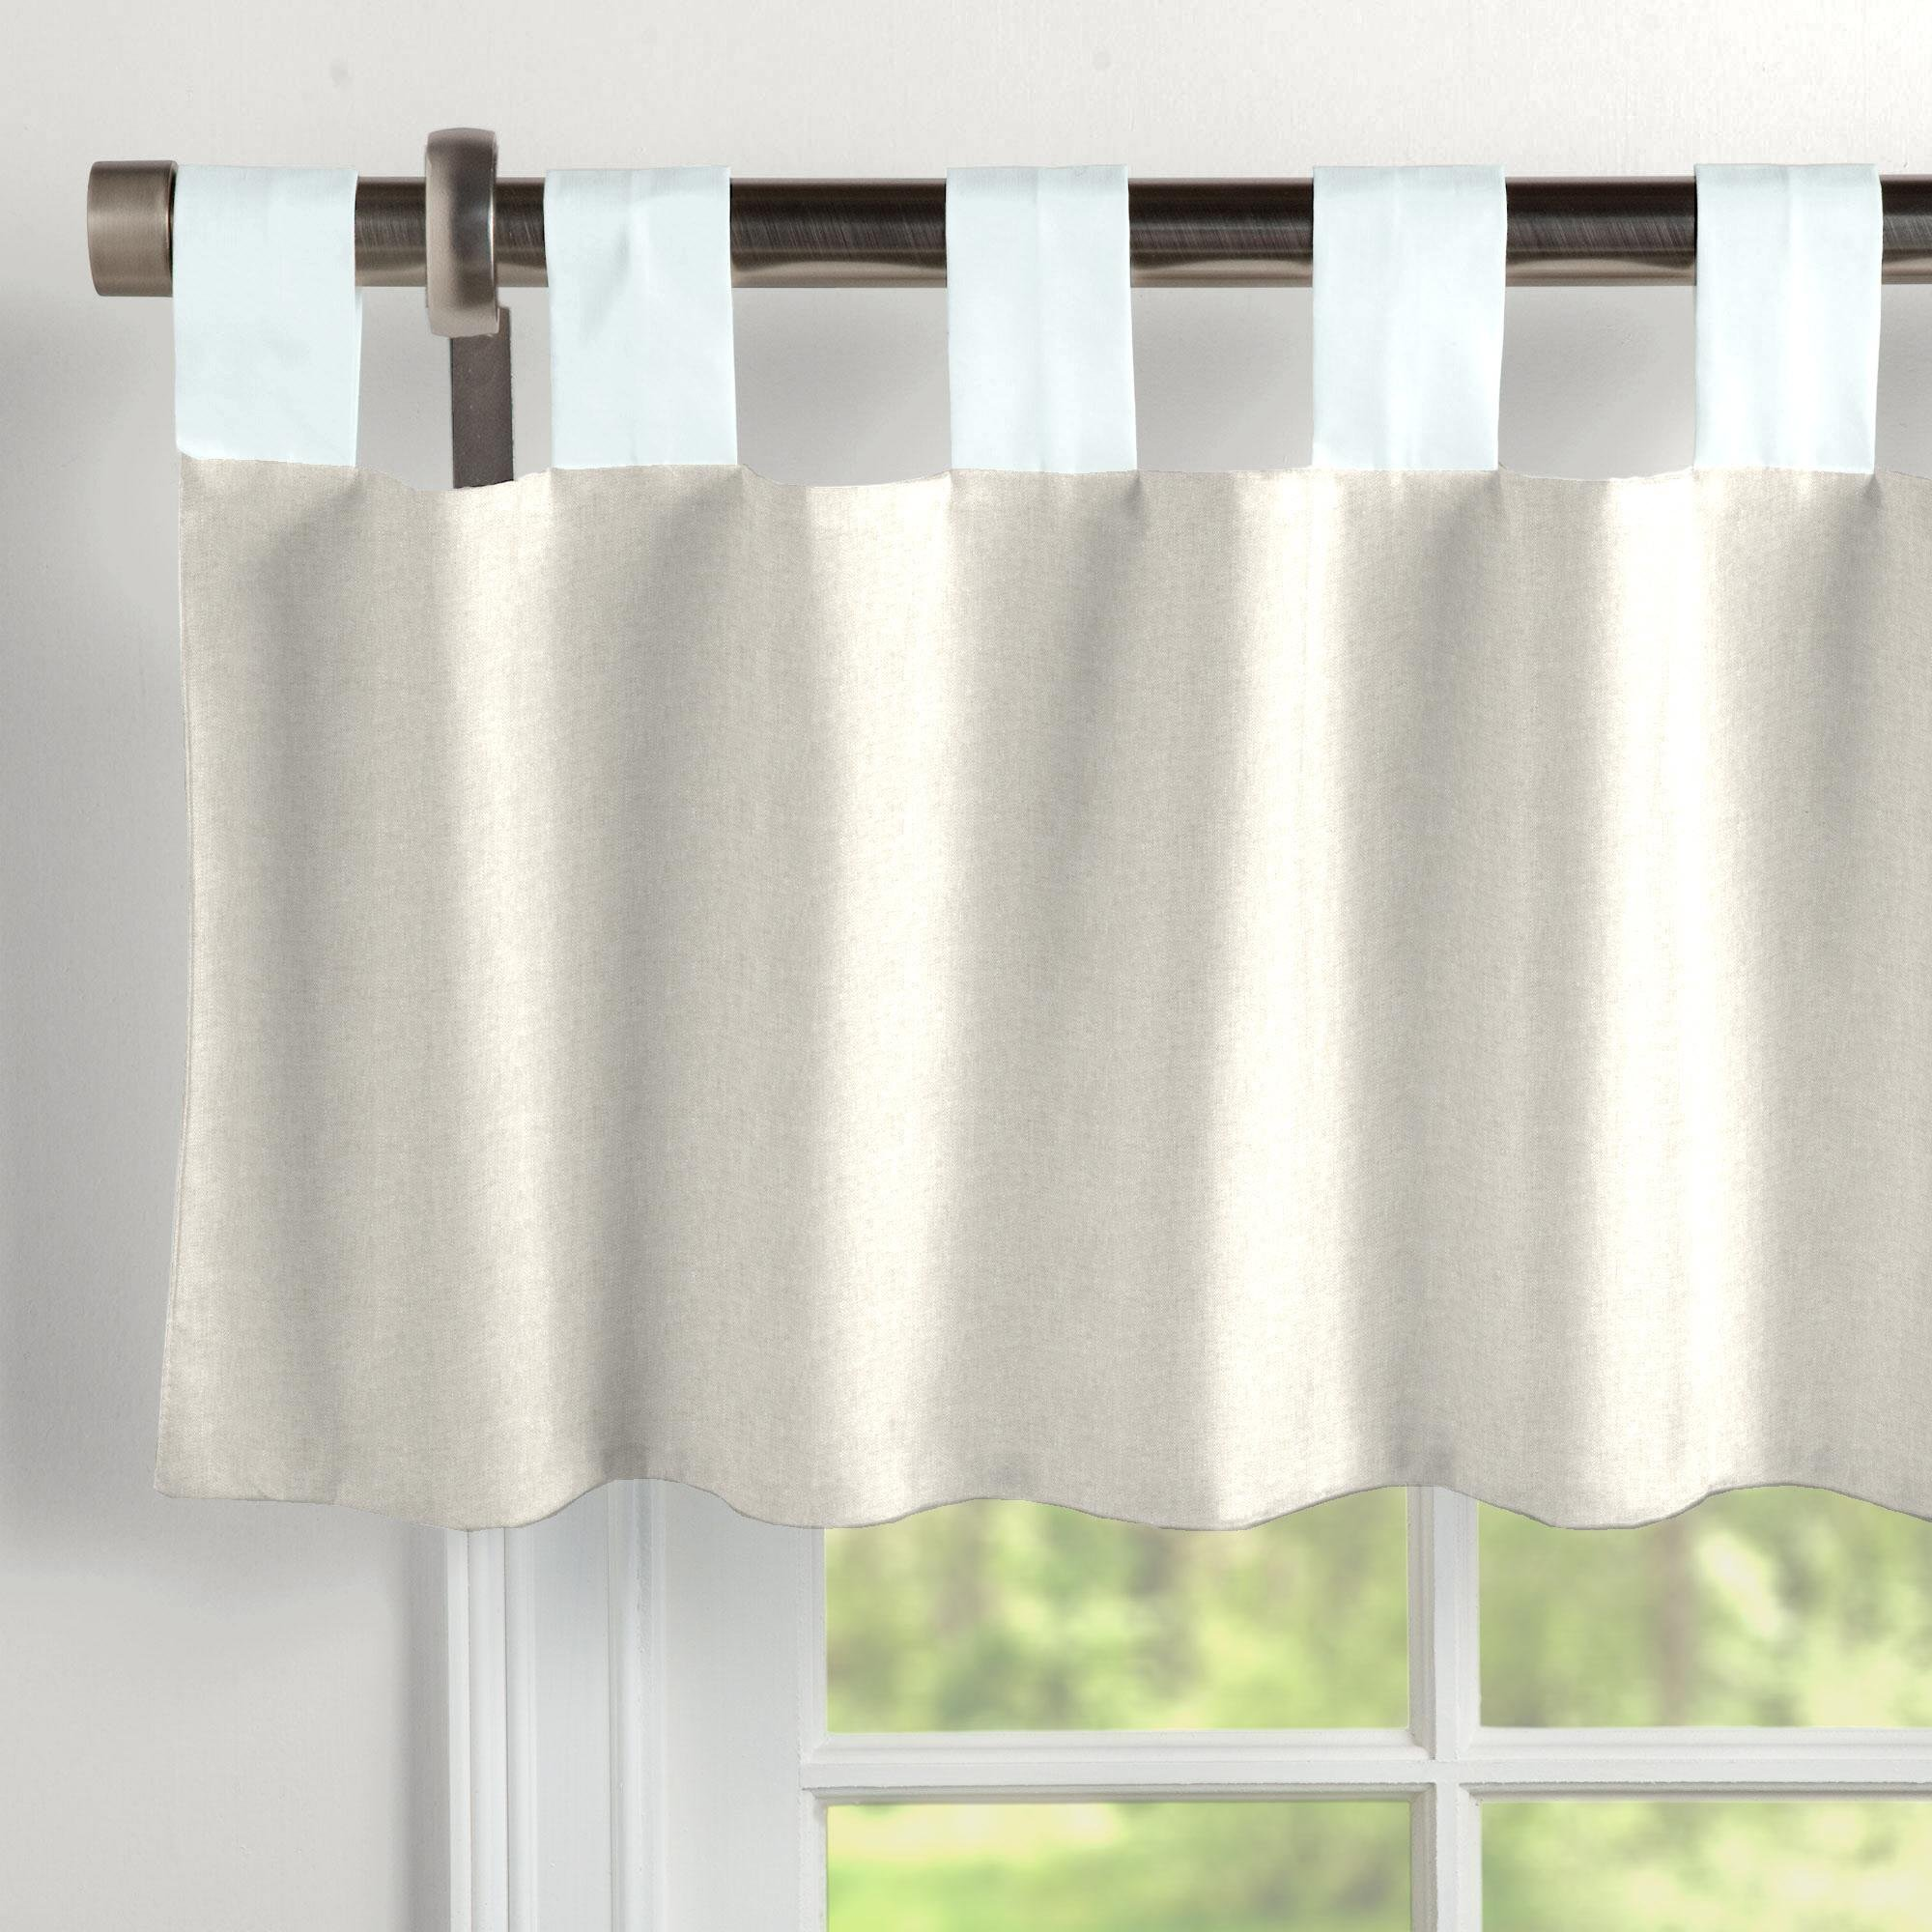 Carousel Designs Light Blue Linen Window Valance Tab-Top